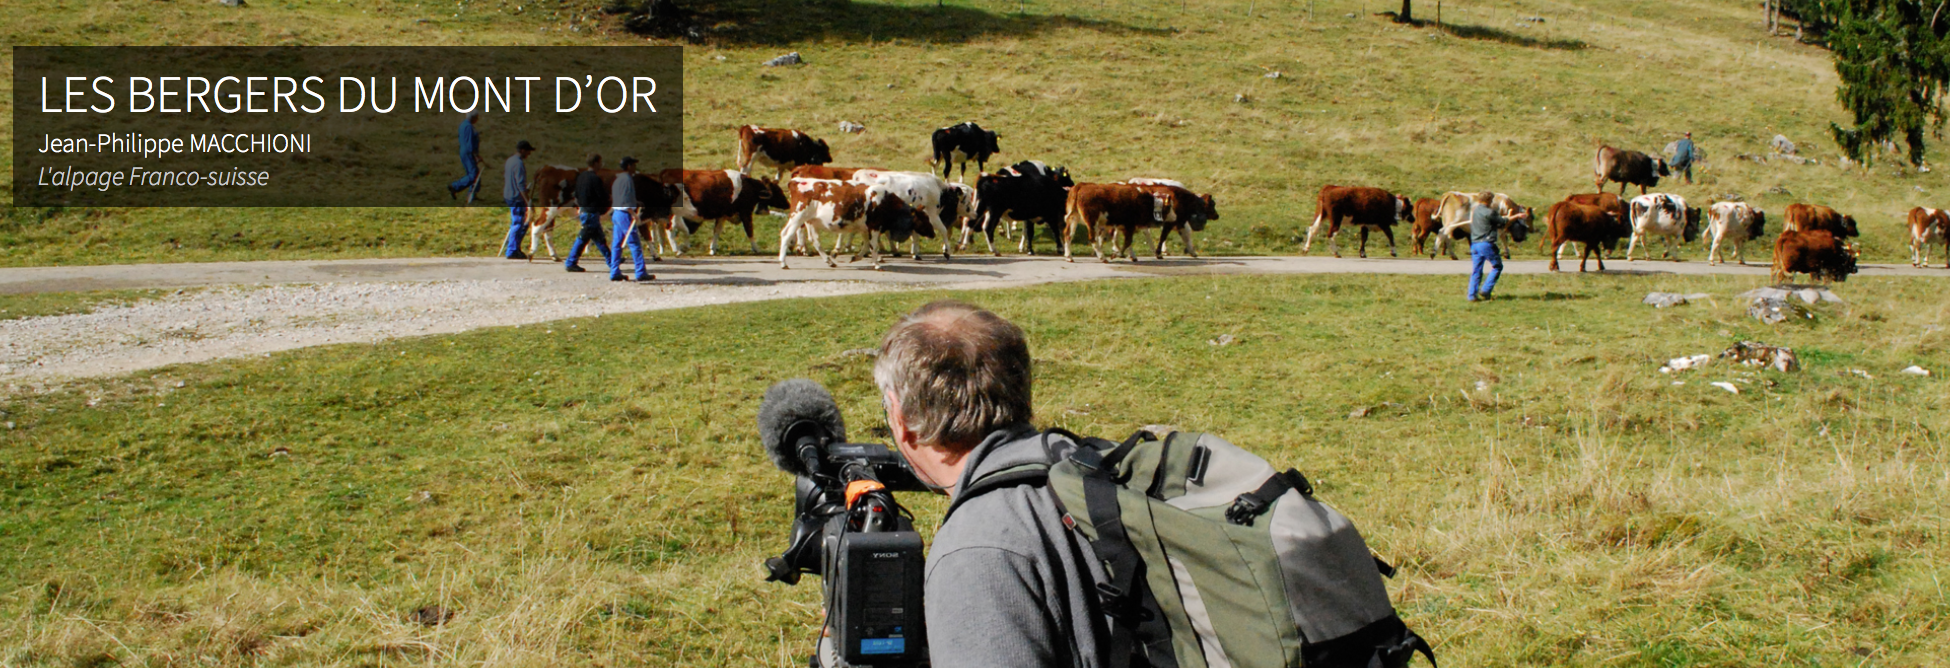 Audiovisual translation for Vie des Hauts Production